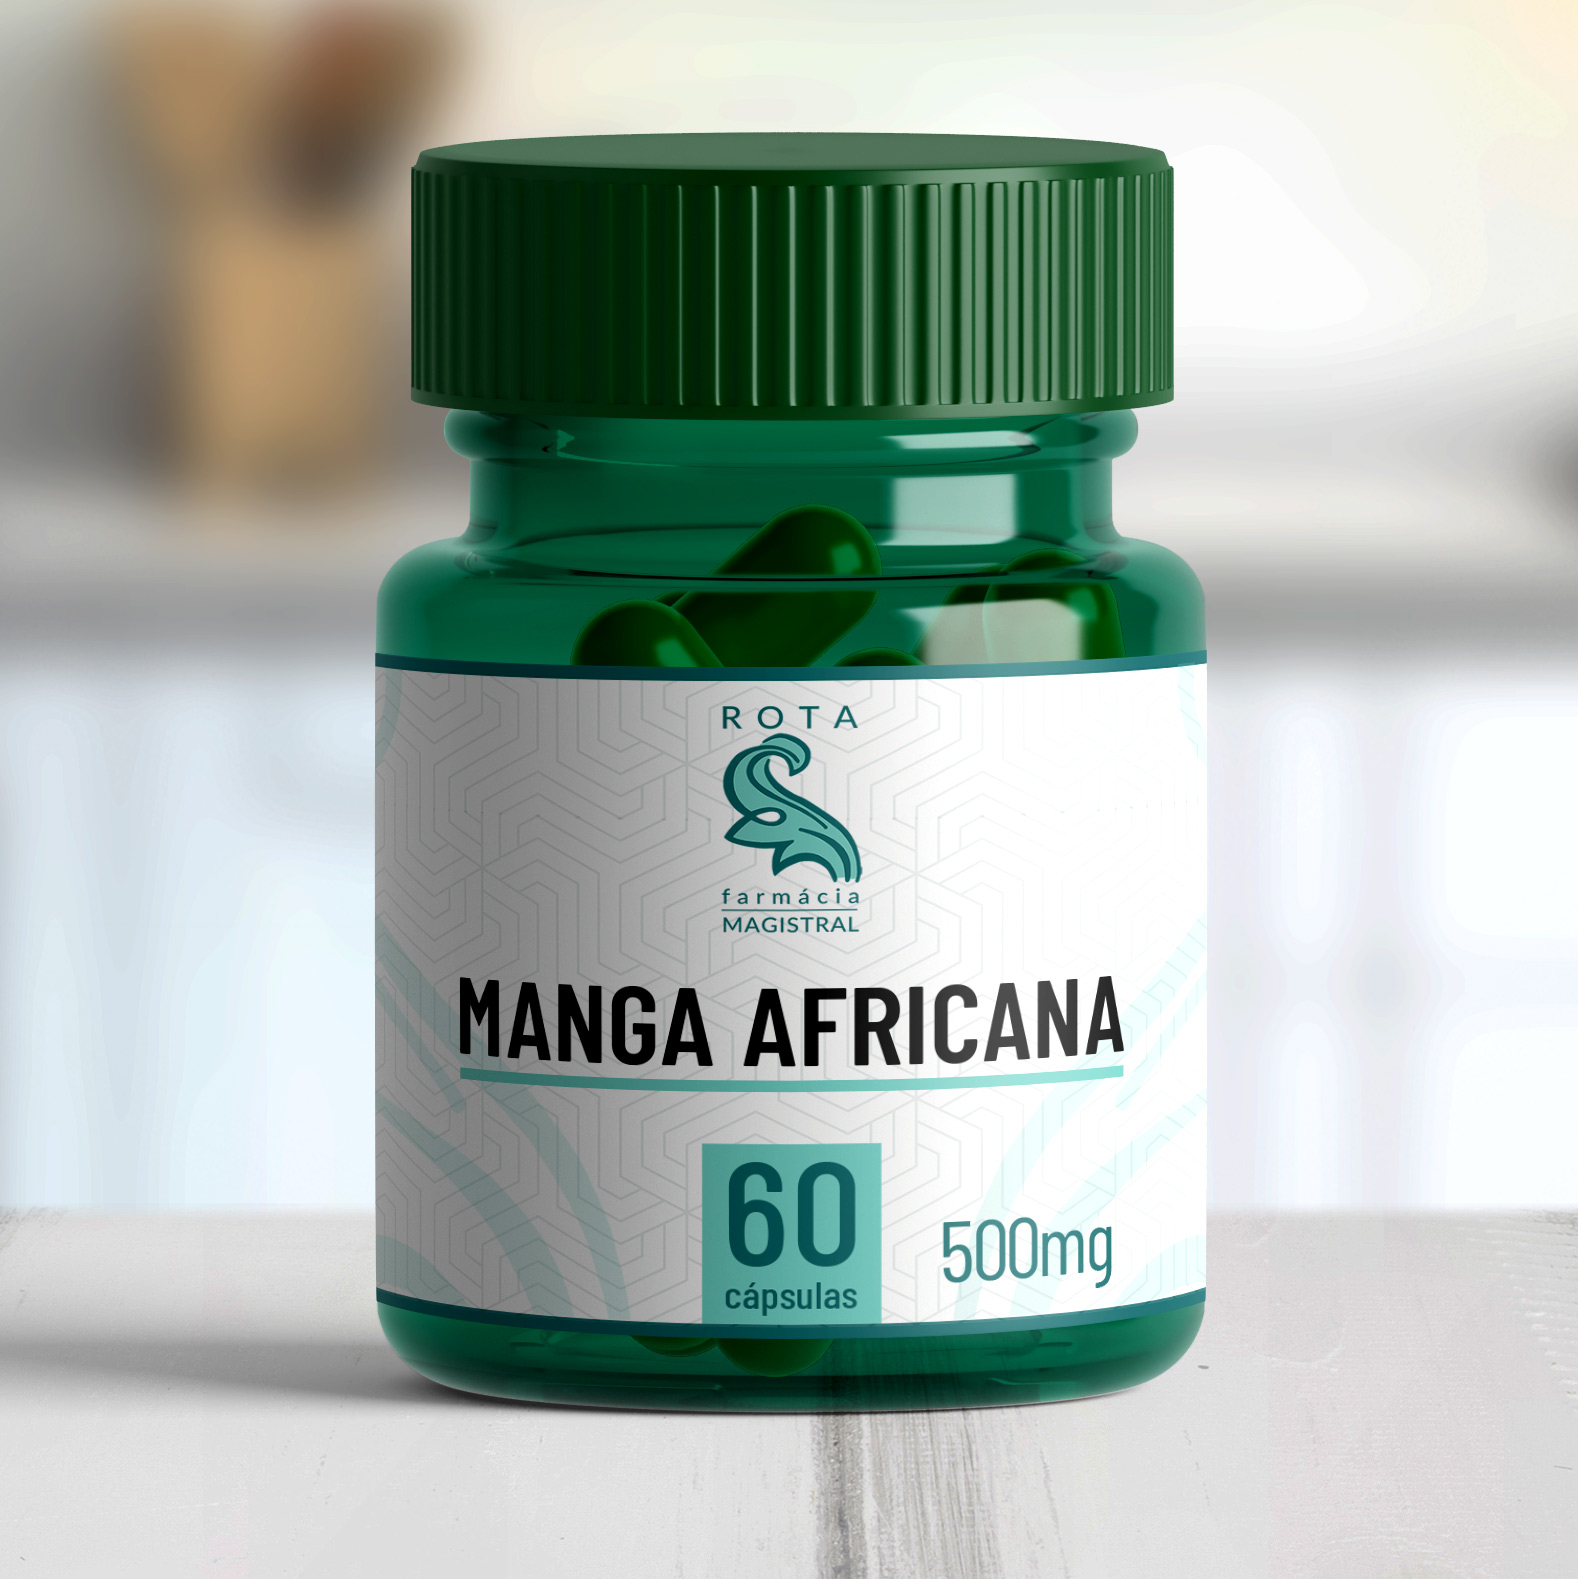 Manga Africana 500mg 60 cápsulas